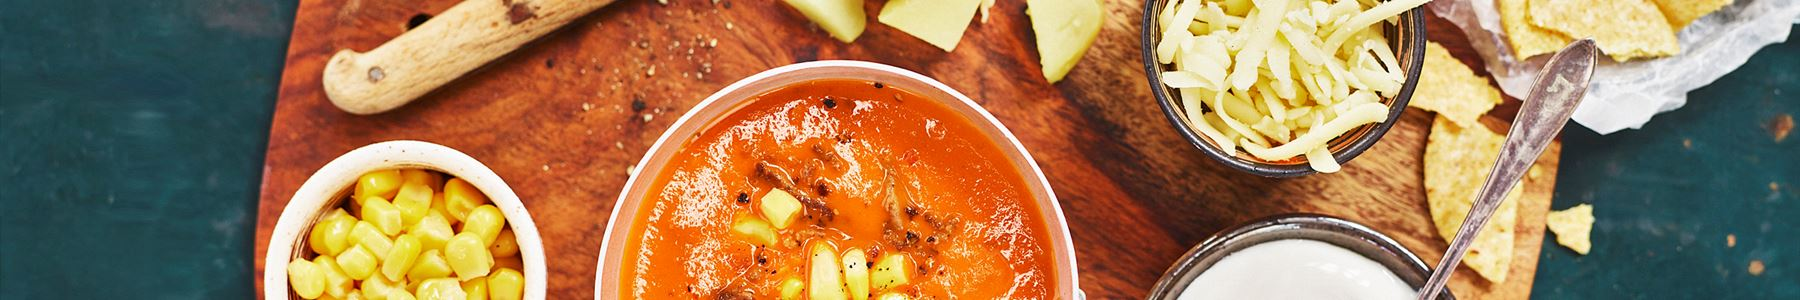 Köttfärs + Gräddfil + Soppa